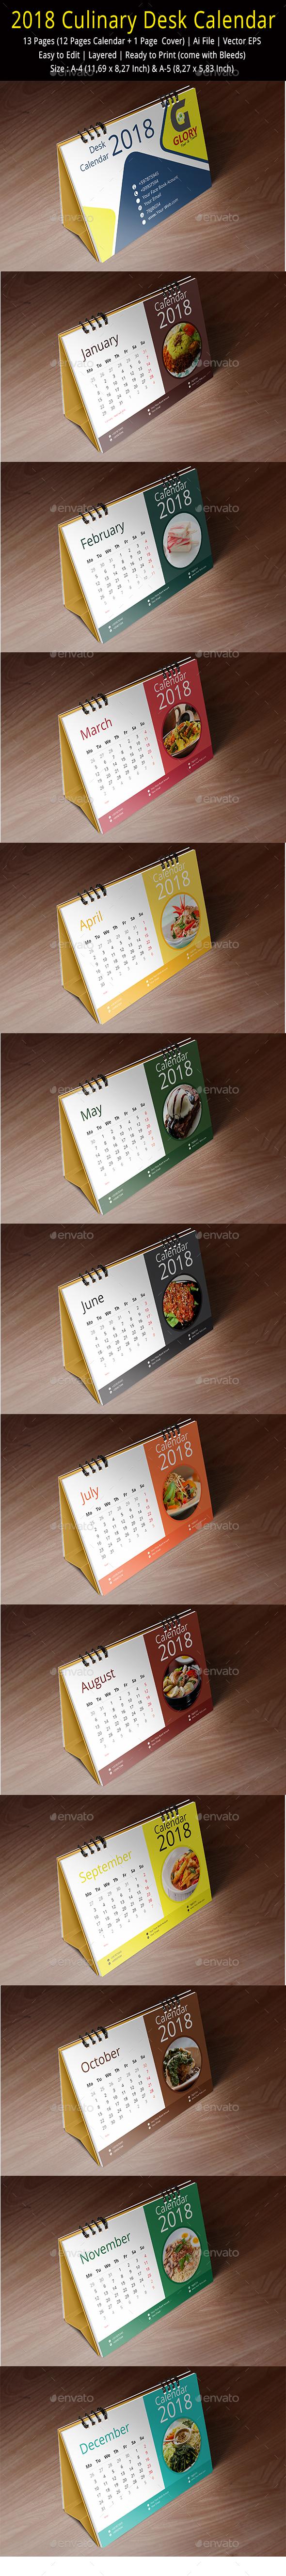 Culinary Desk Calendar 2018